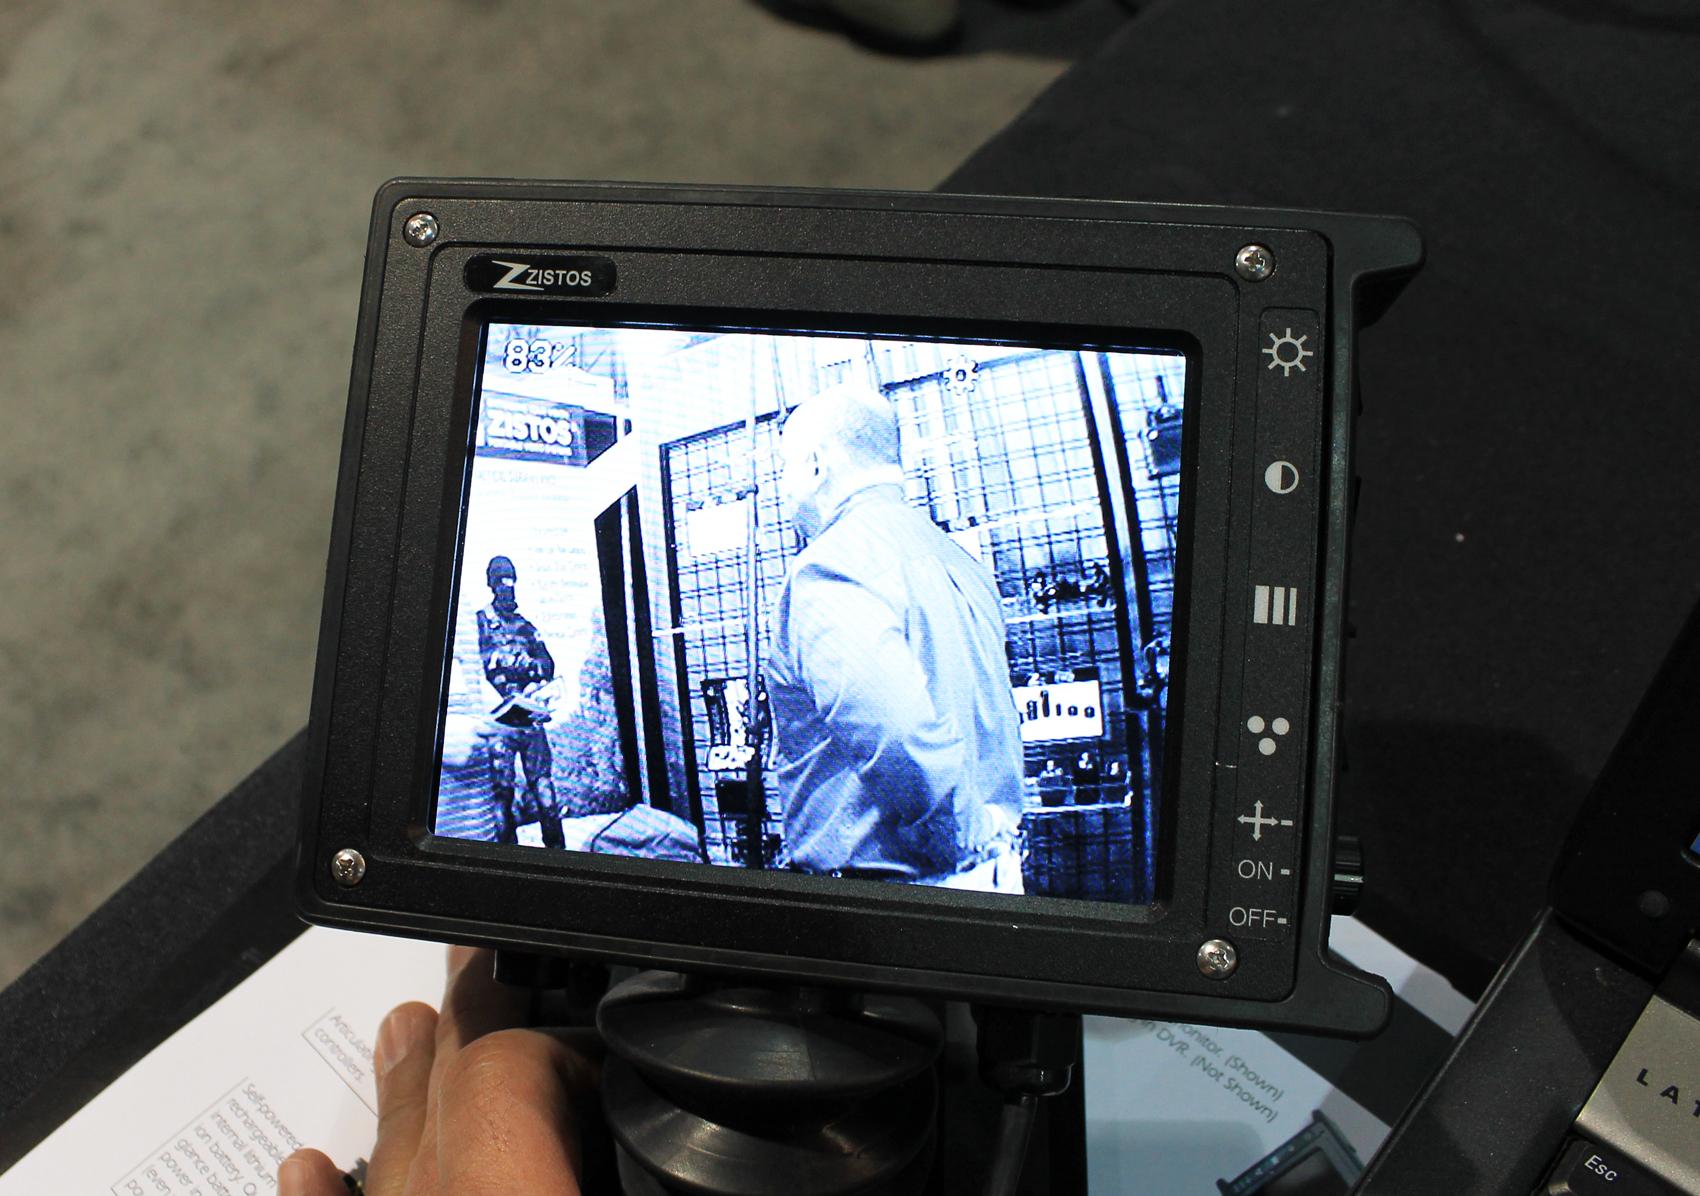 Zistos LCD Monitor